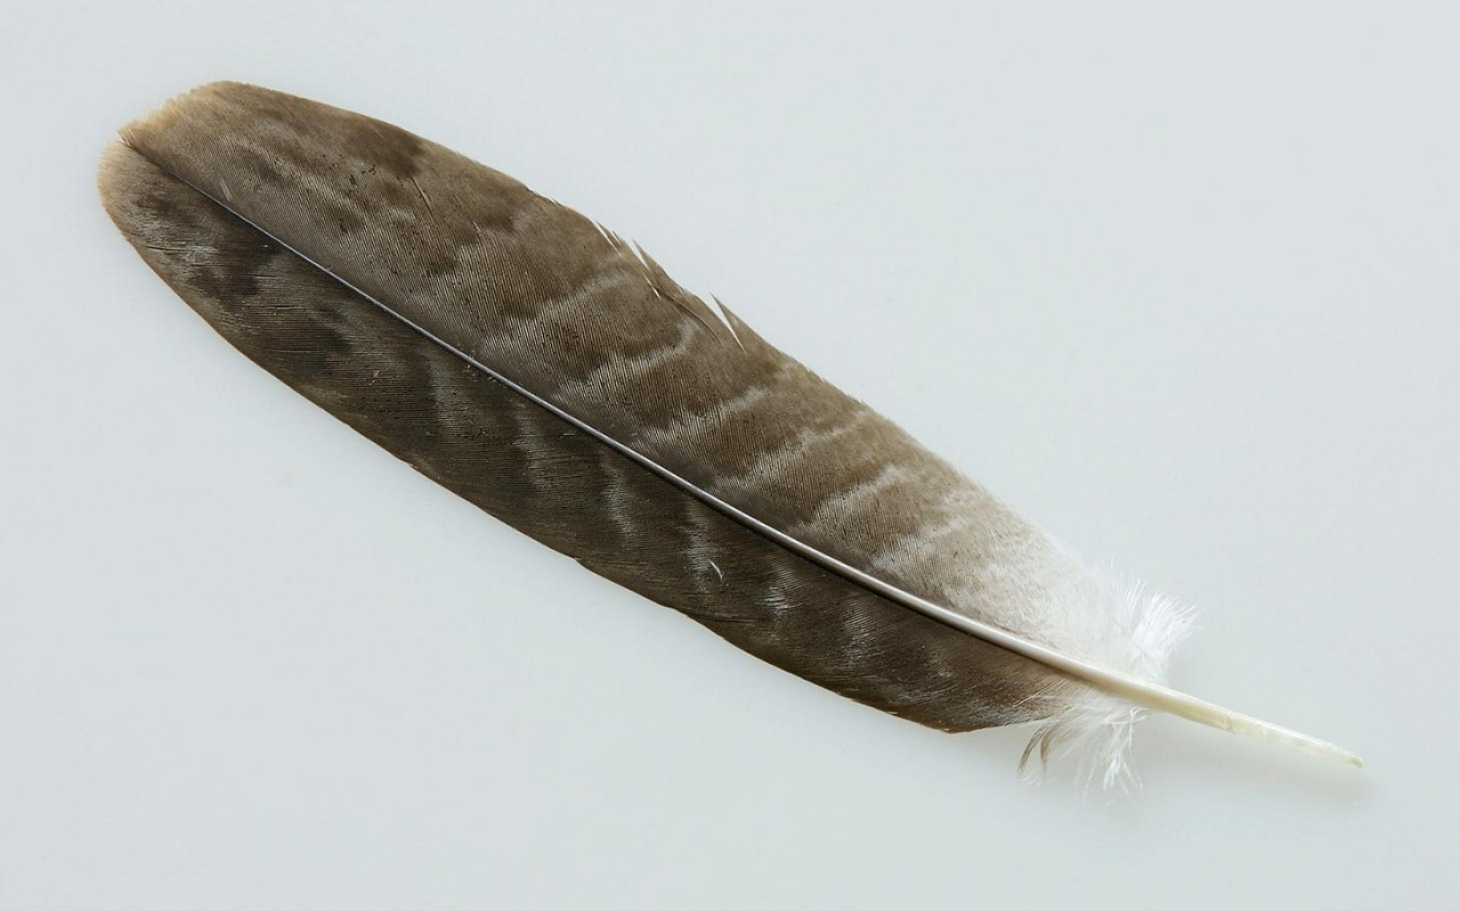 California Student May Wear Eagle Feather Al Jazeera America